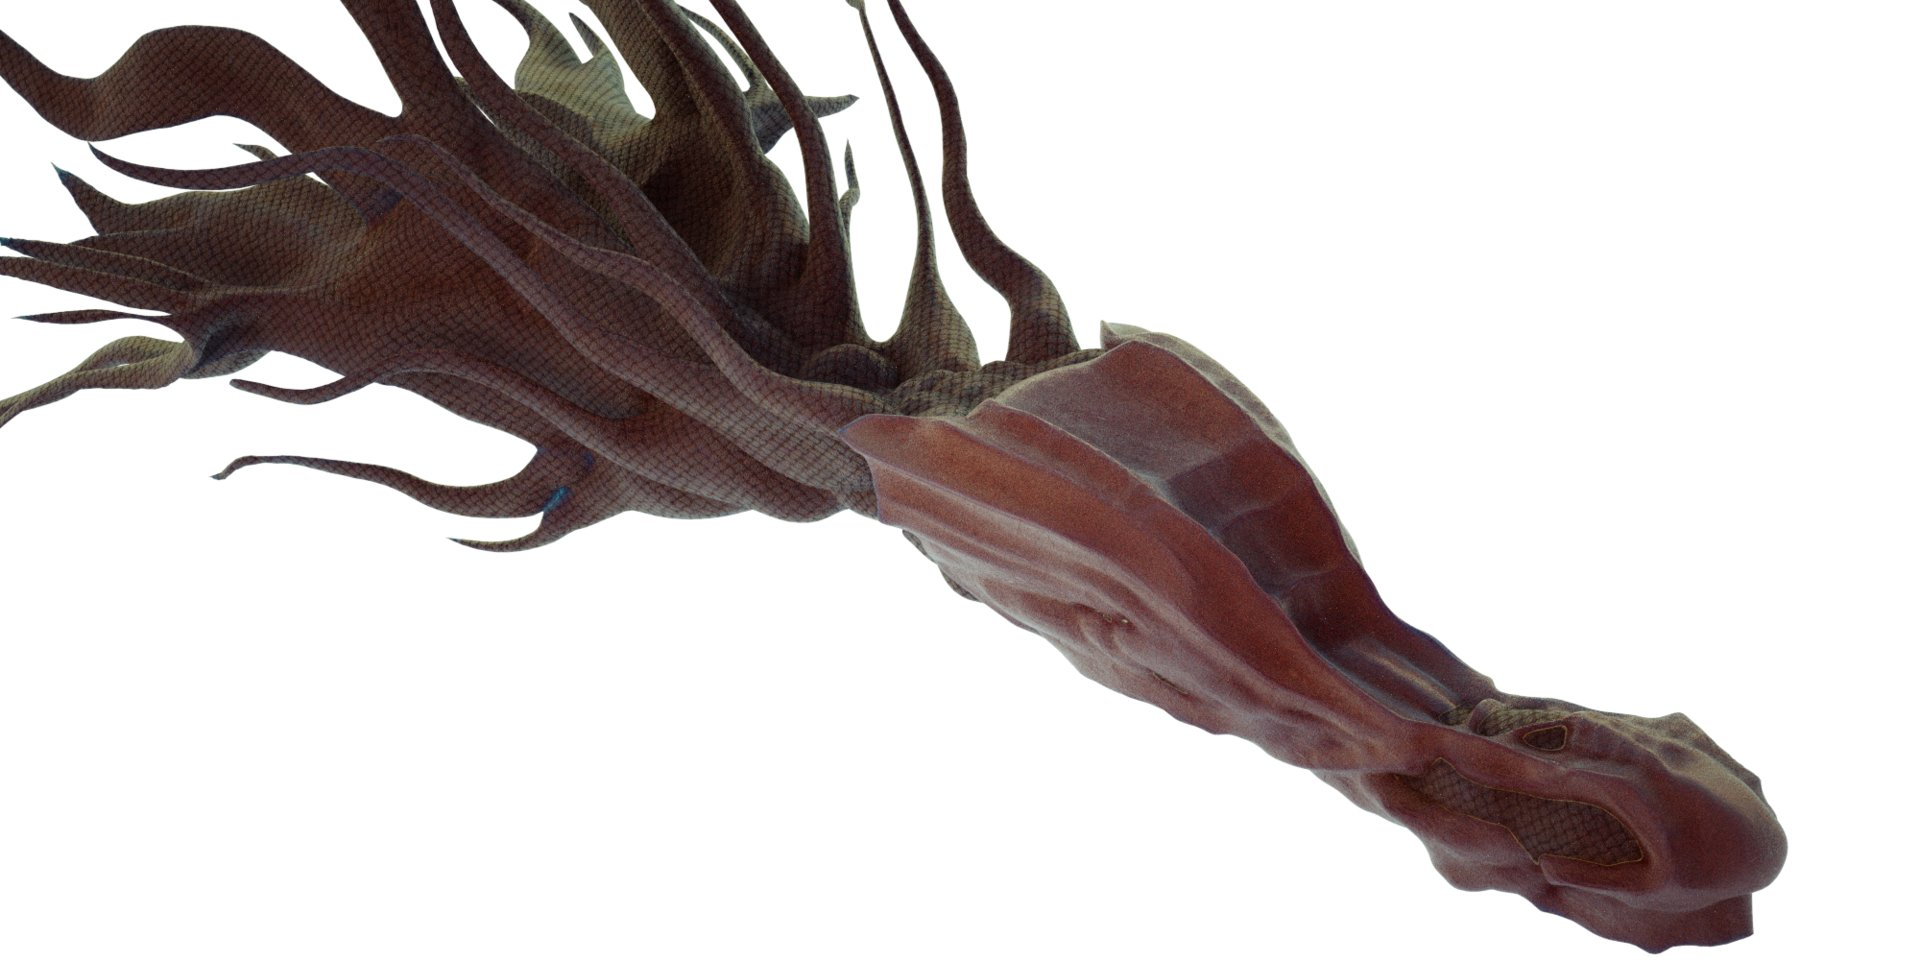 Kresimir jelusic fishy9